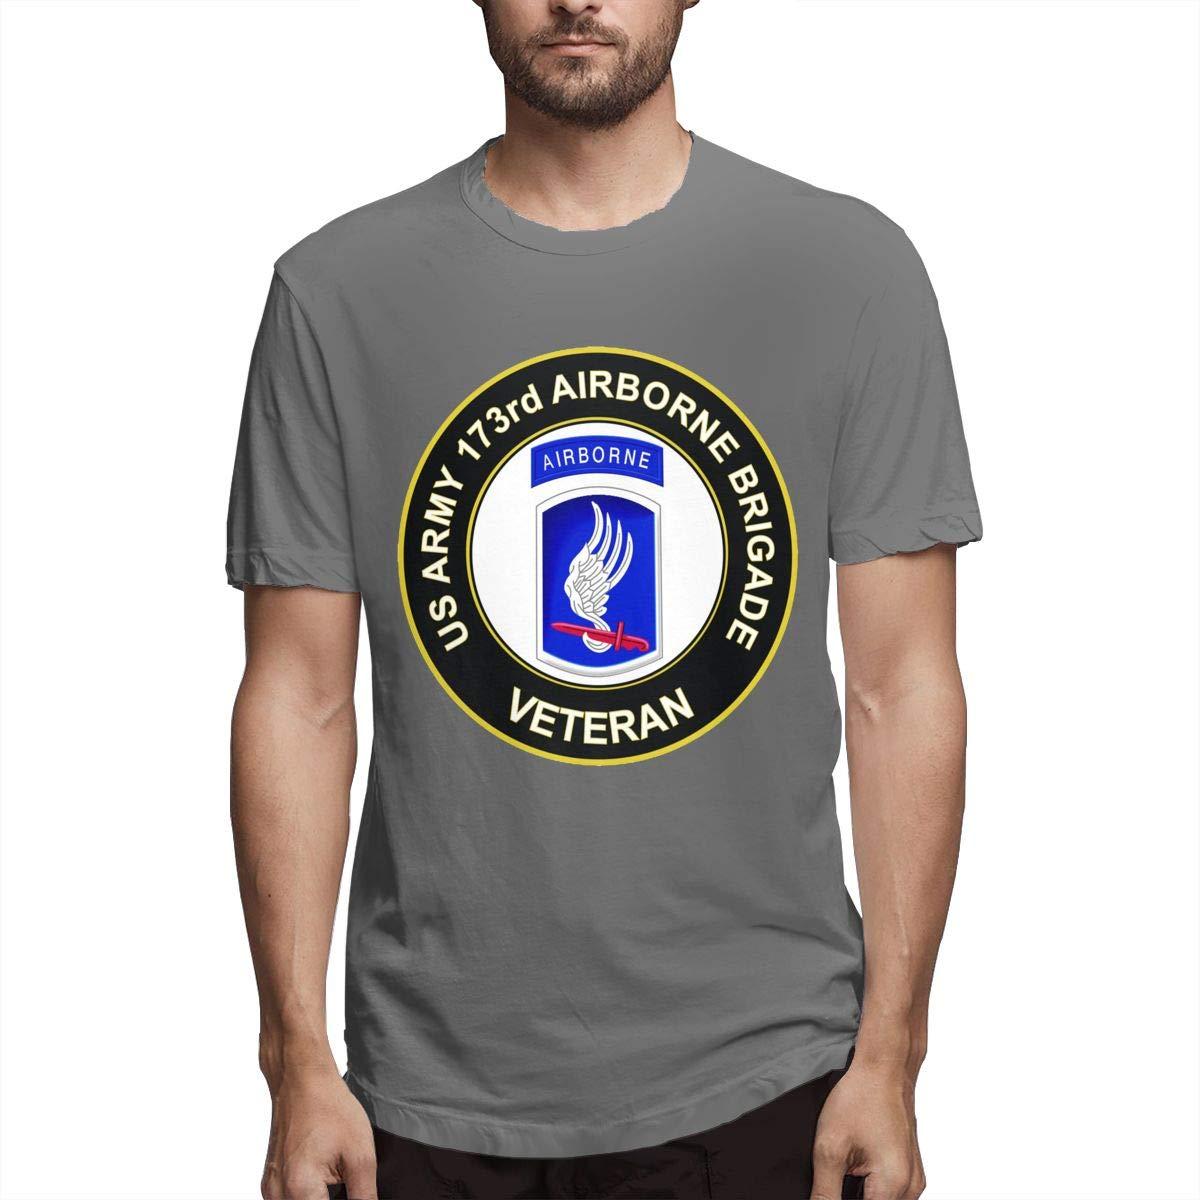 Zzlll U.s. Army 173rd Airborne Brigade Veteran T-shirt T-shirt